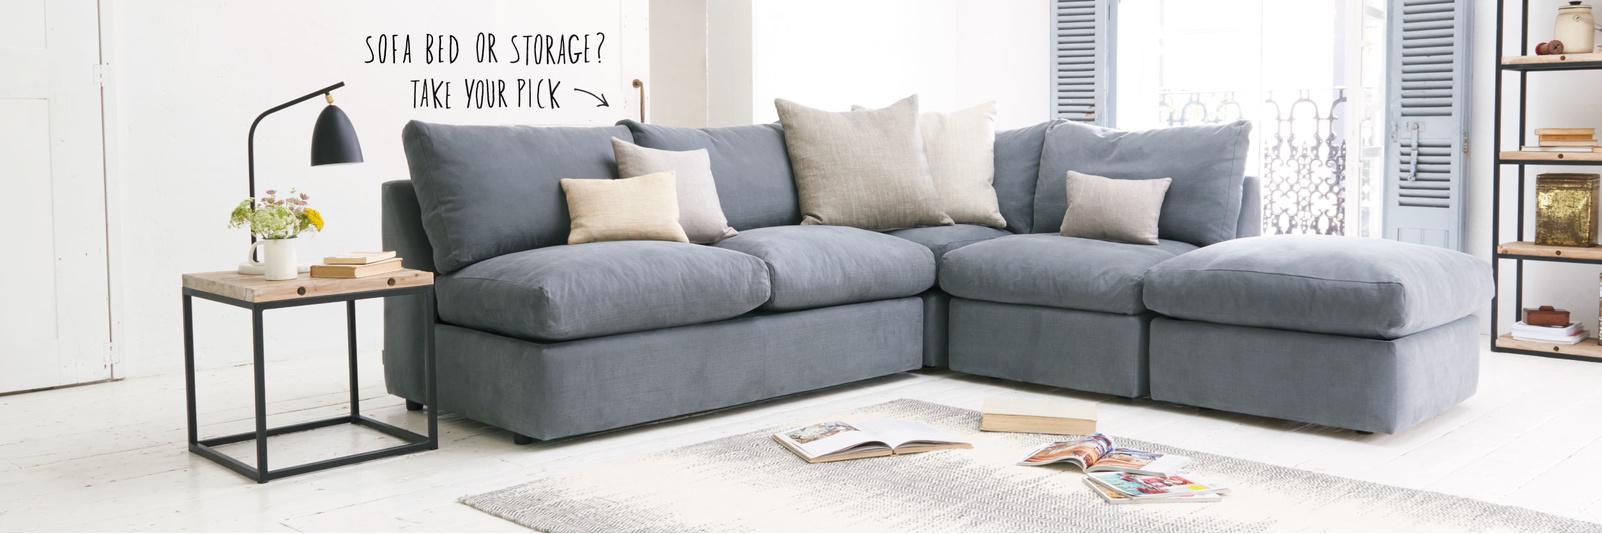 Chatnap modular sofa